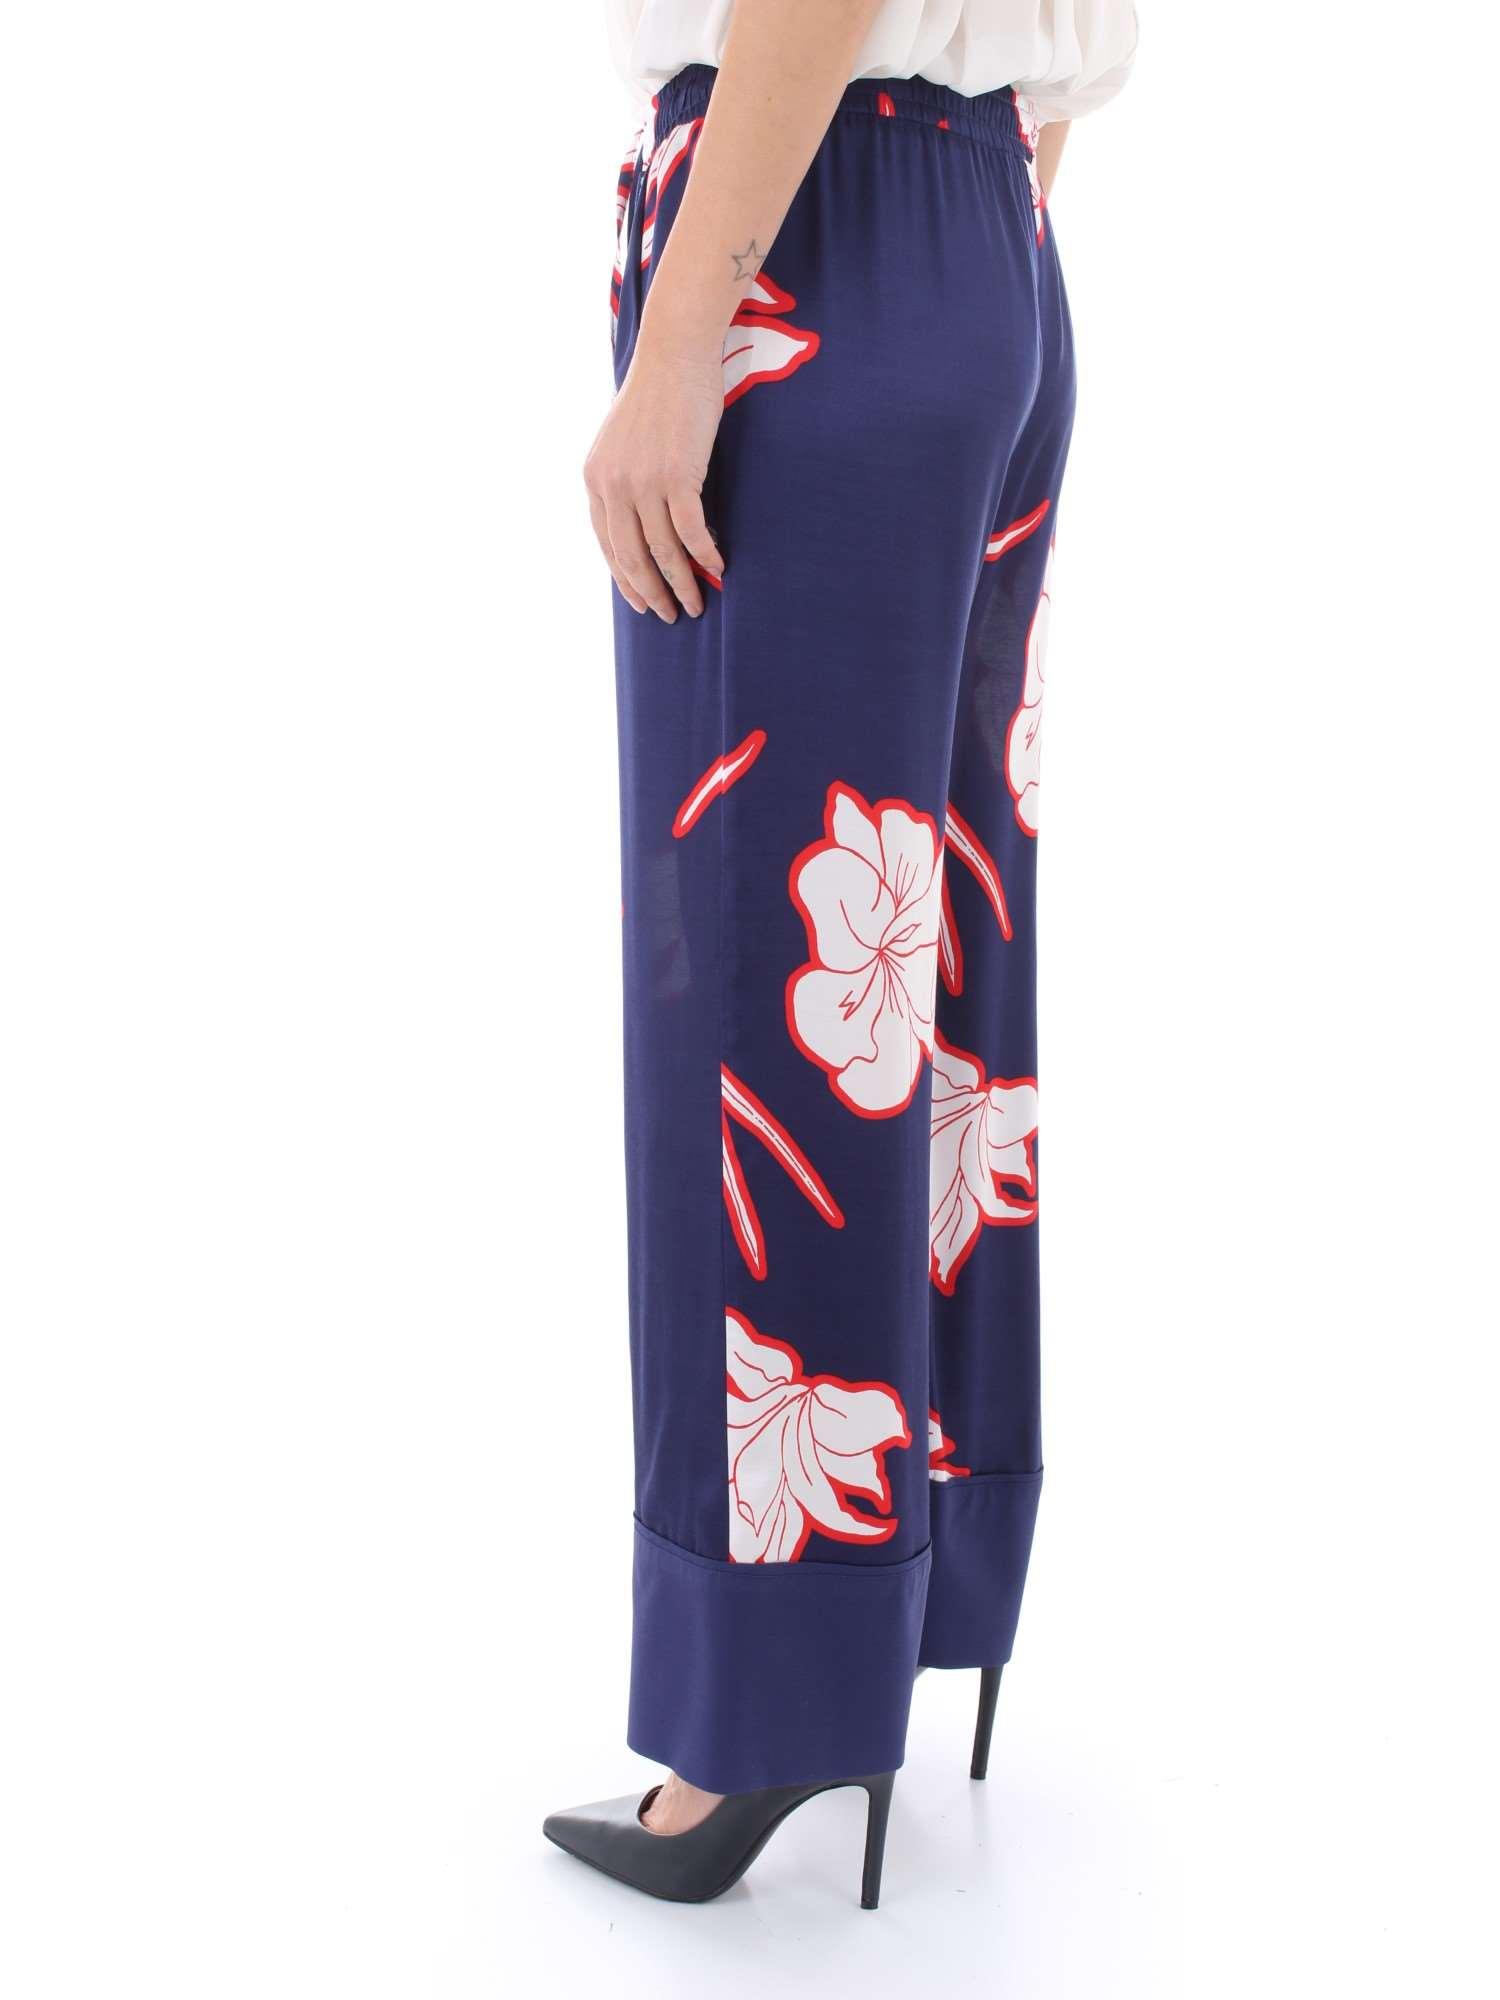 Pantaloni Donna 1g13wd Pinko estate er4 7329 Blu Dimagrante Primavera 6YXwa